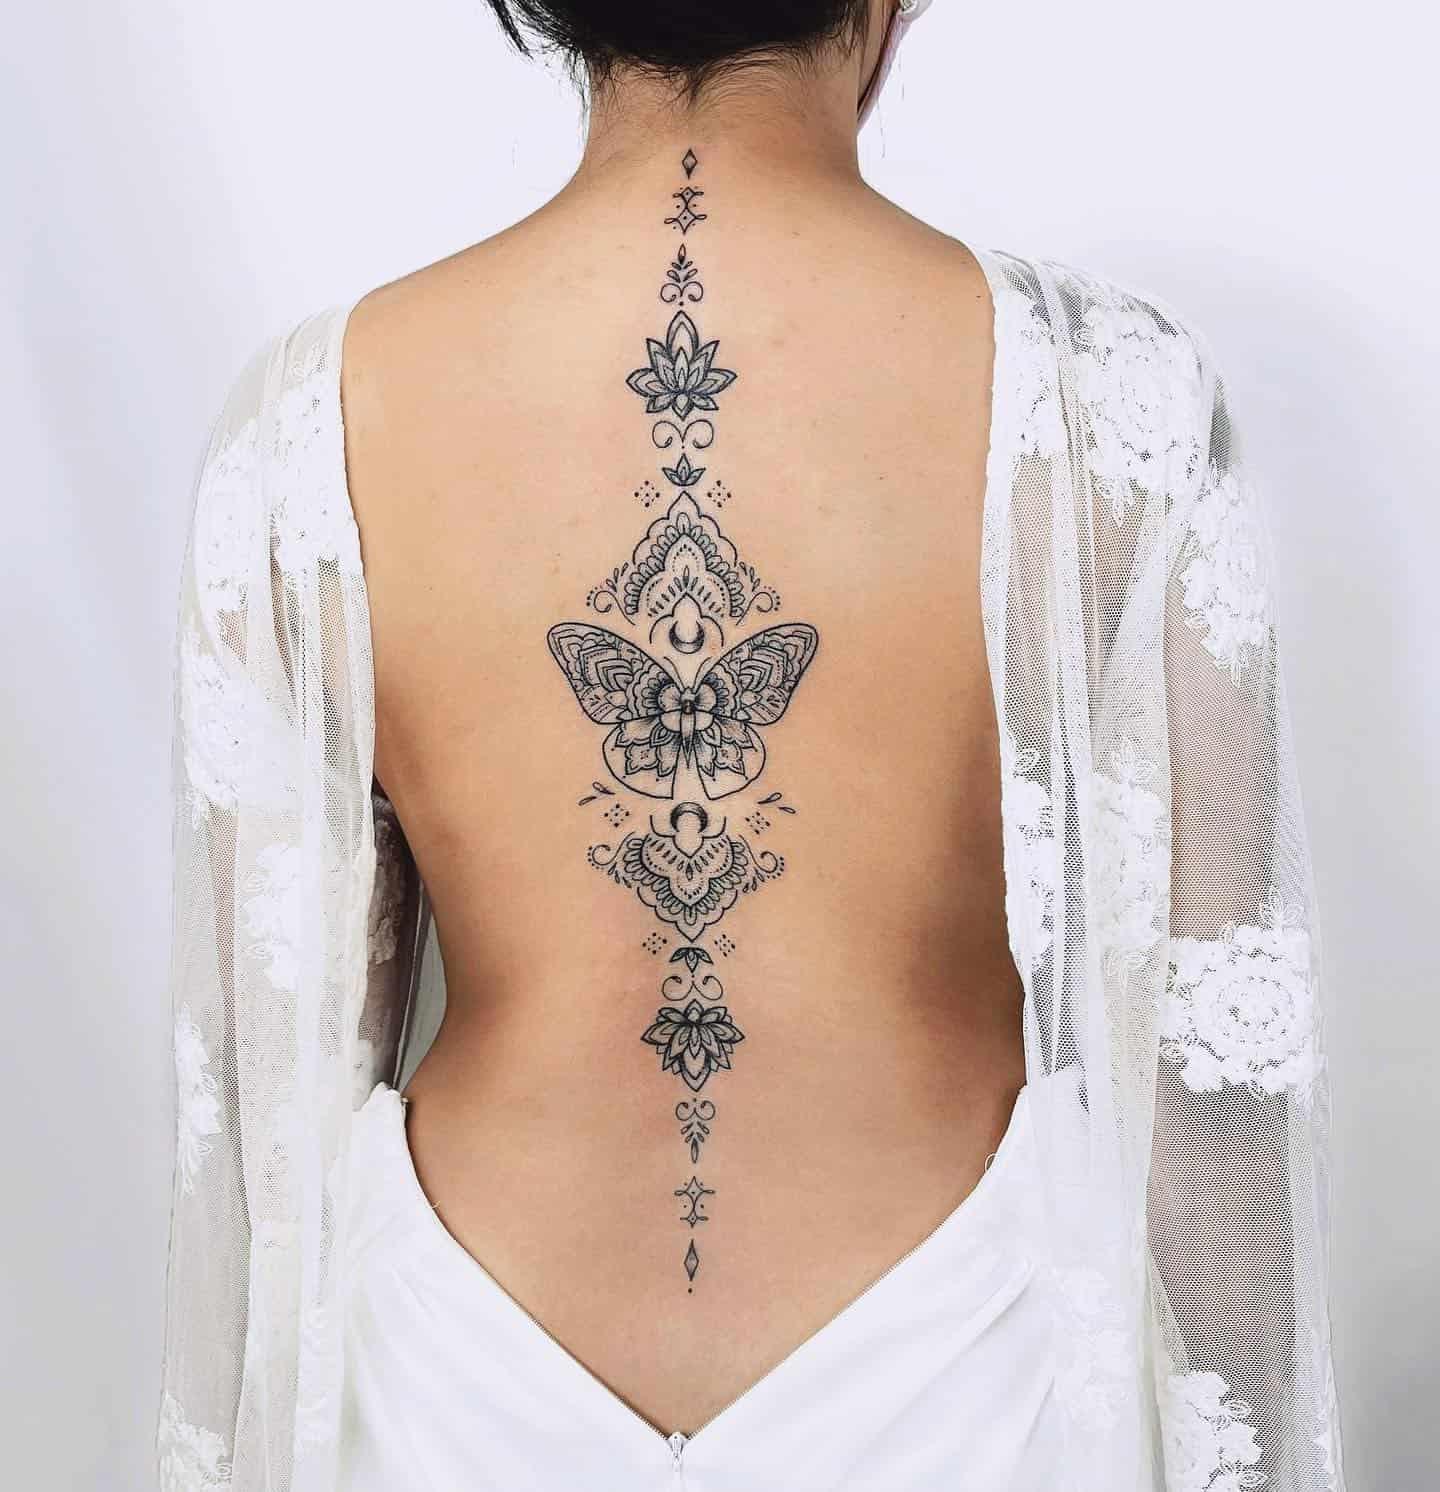 20 Sexy Tattoo Design Ideas for Women 20 Updated   Saved Tattoo